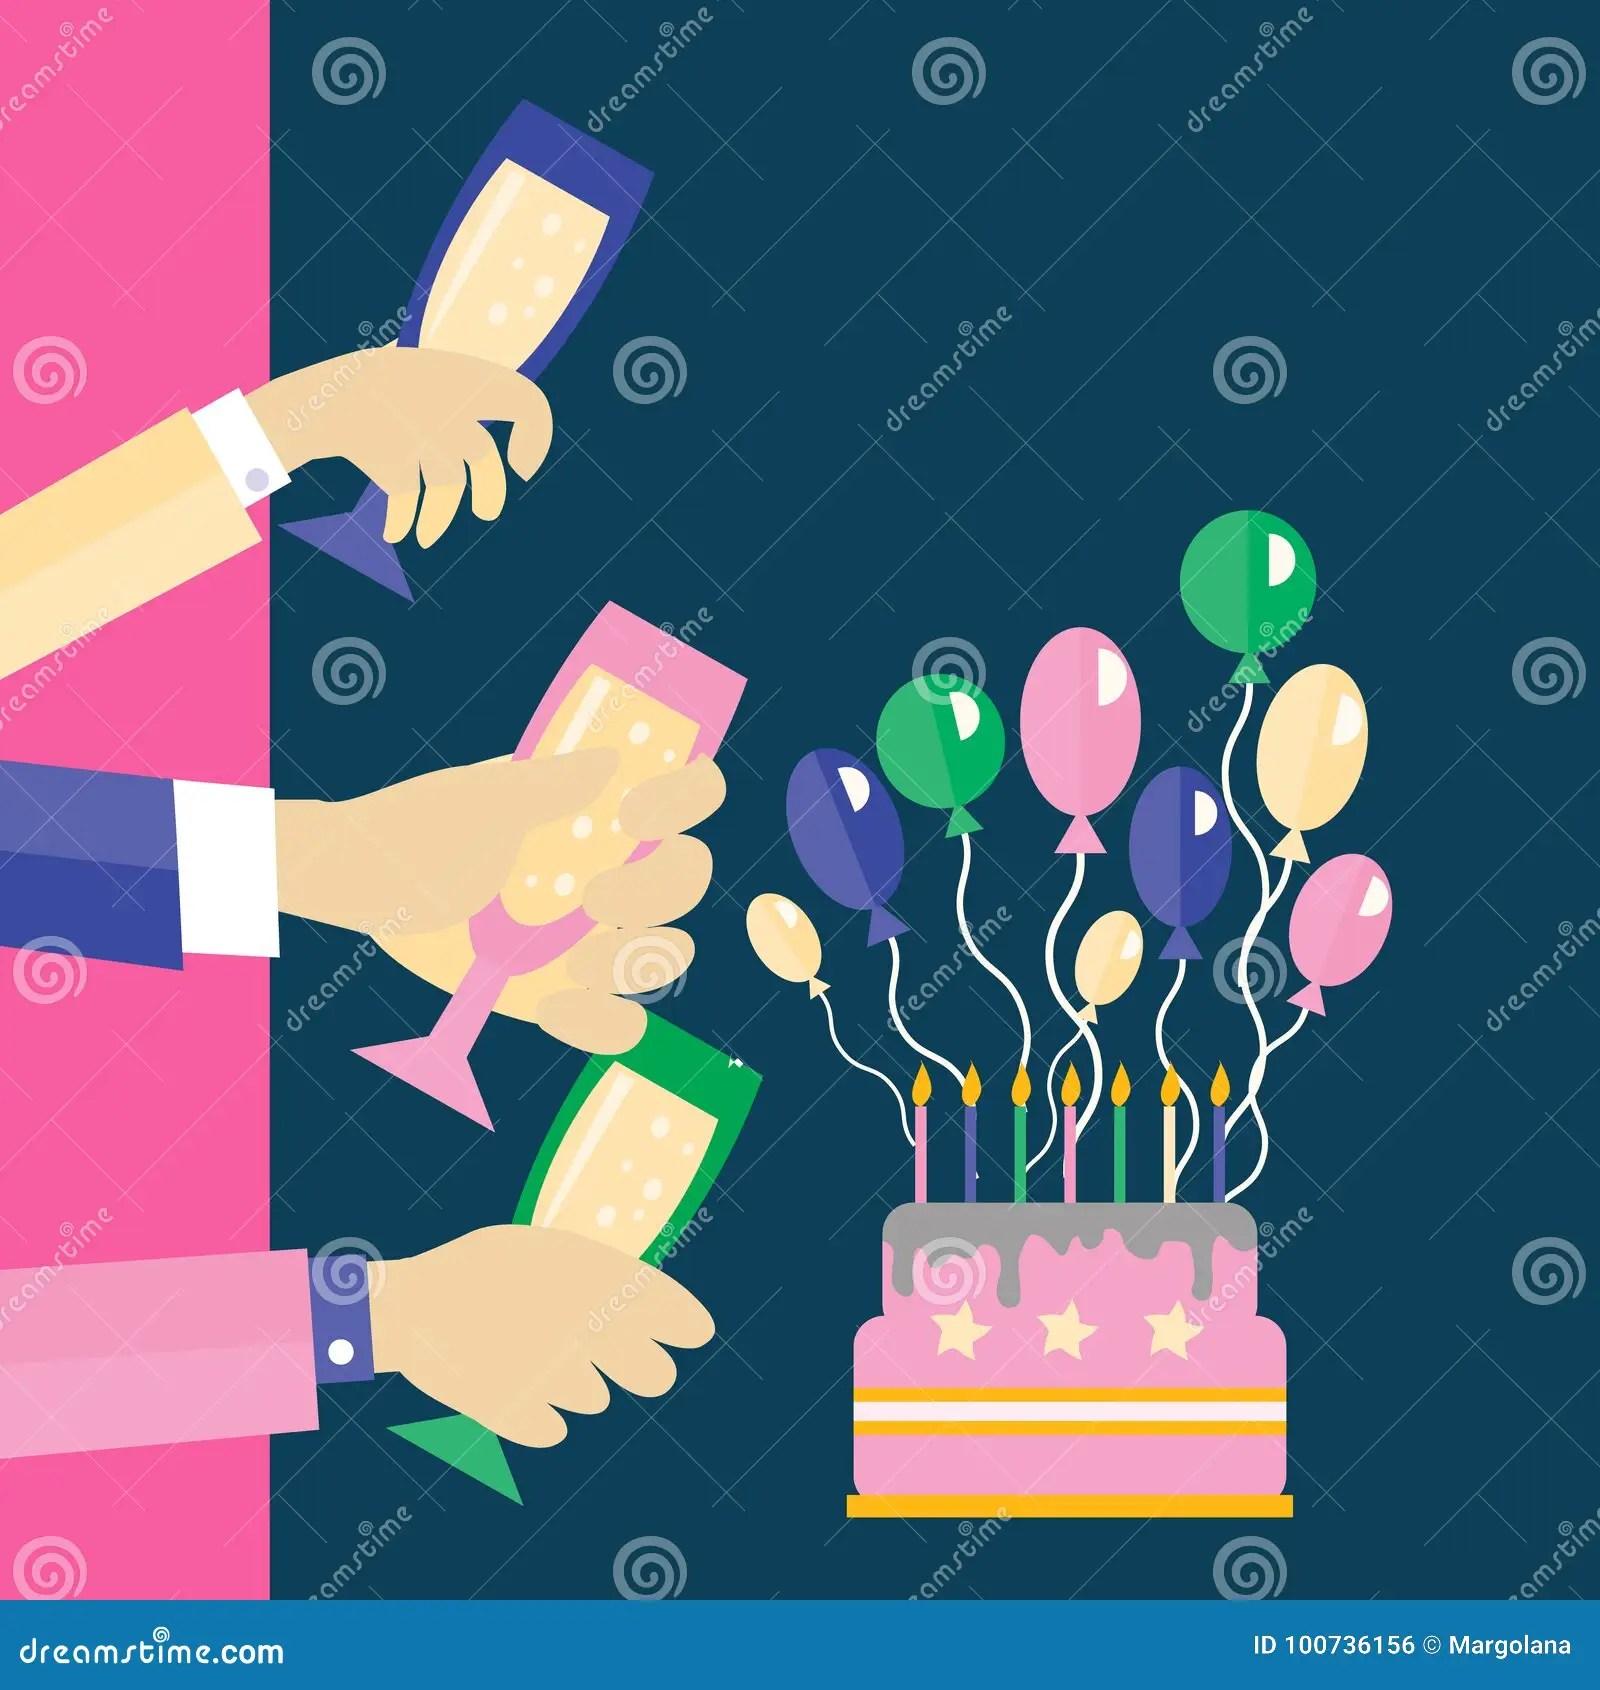 invitation card for celebration